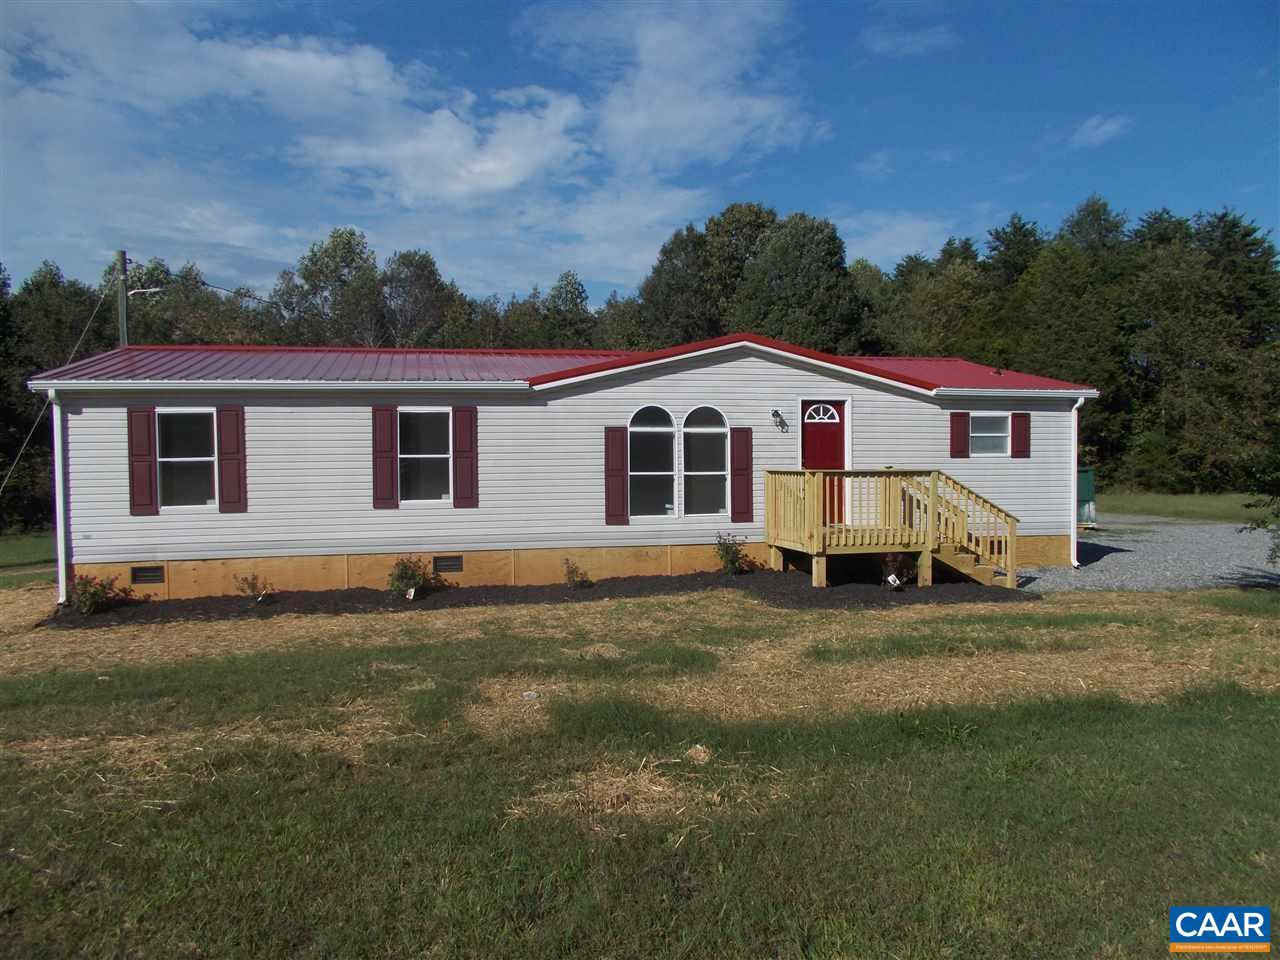 723 MICKIE TOWN RD, MAIDENS, VA 23102